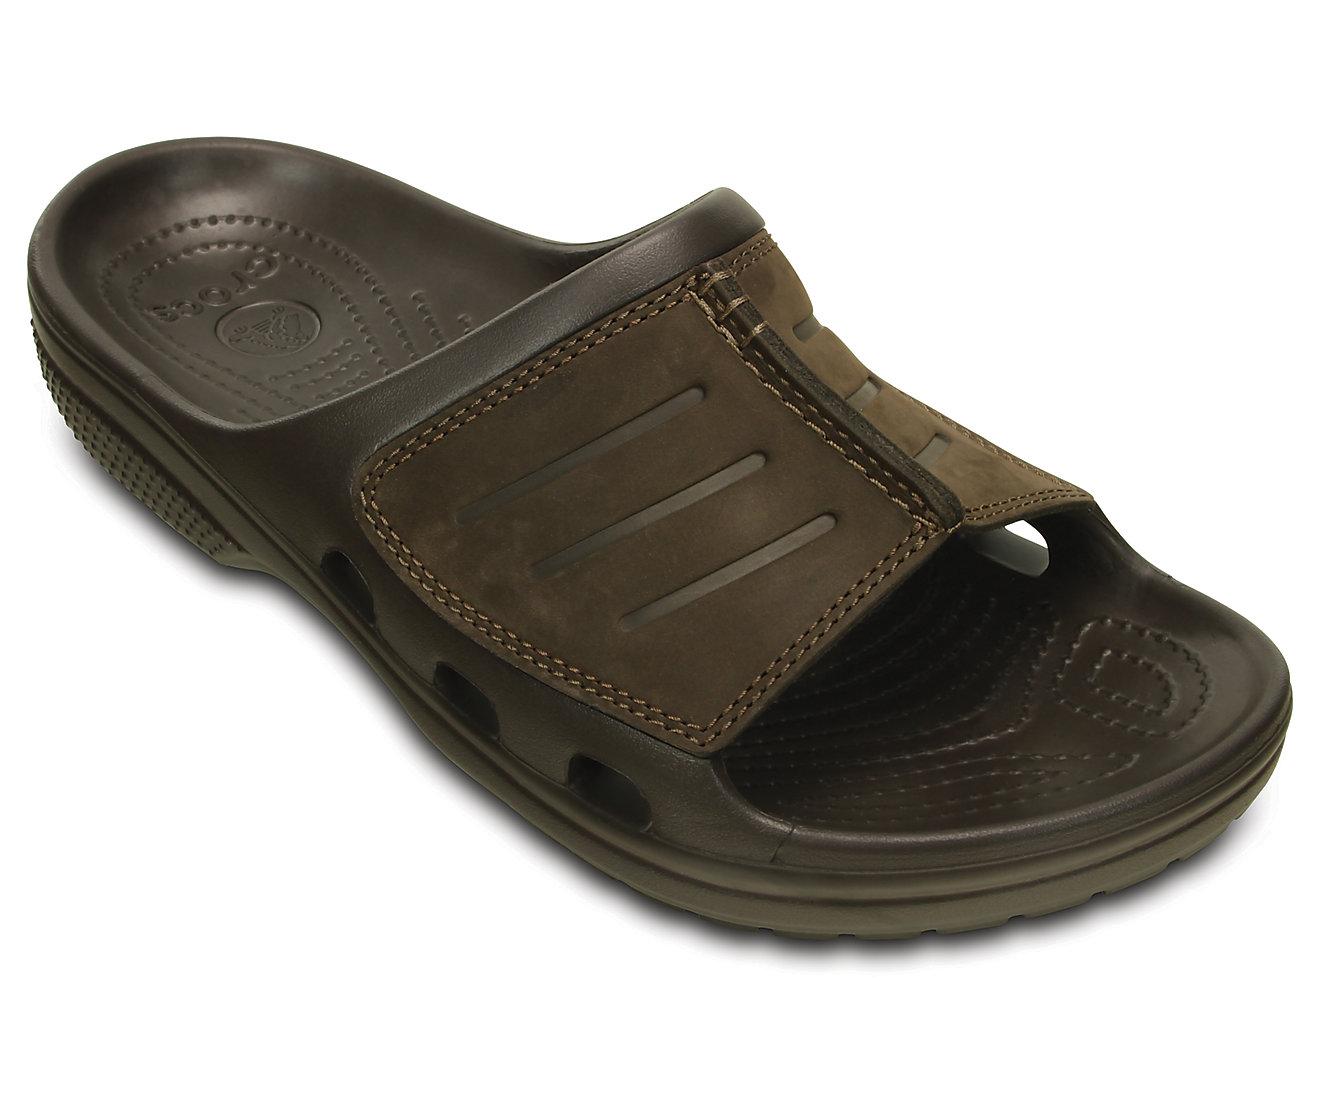 Homme Yukon Slide Sandales Pour Mesa 6gyY7vbf